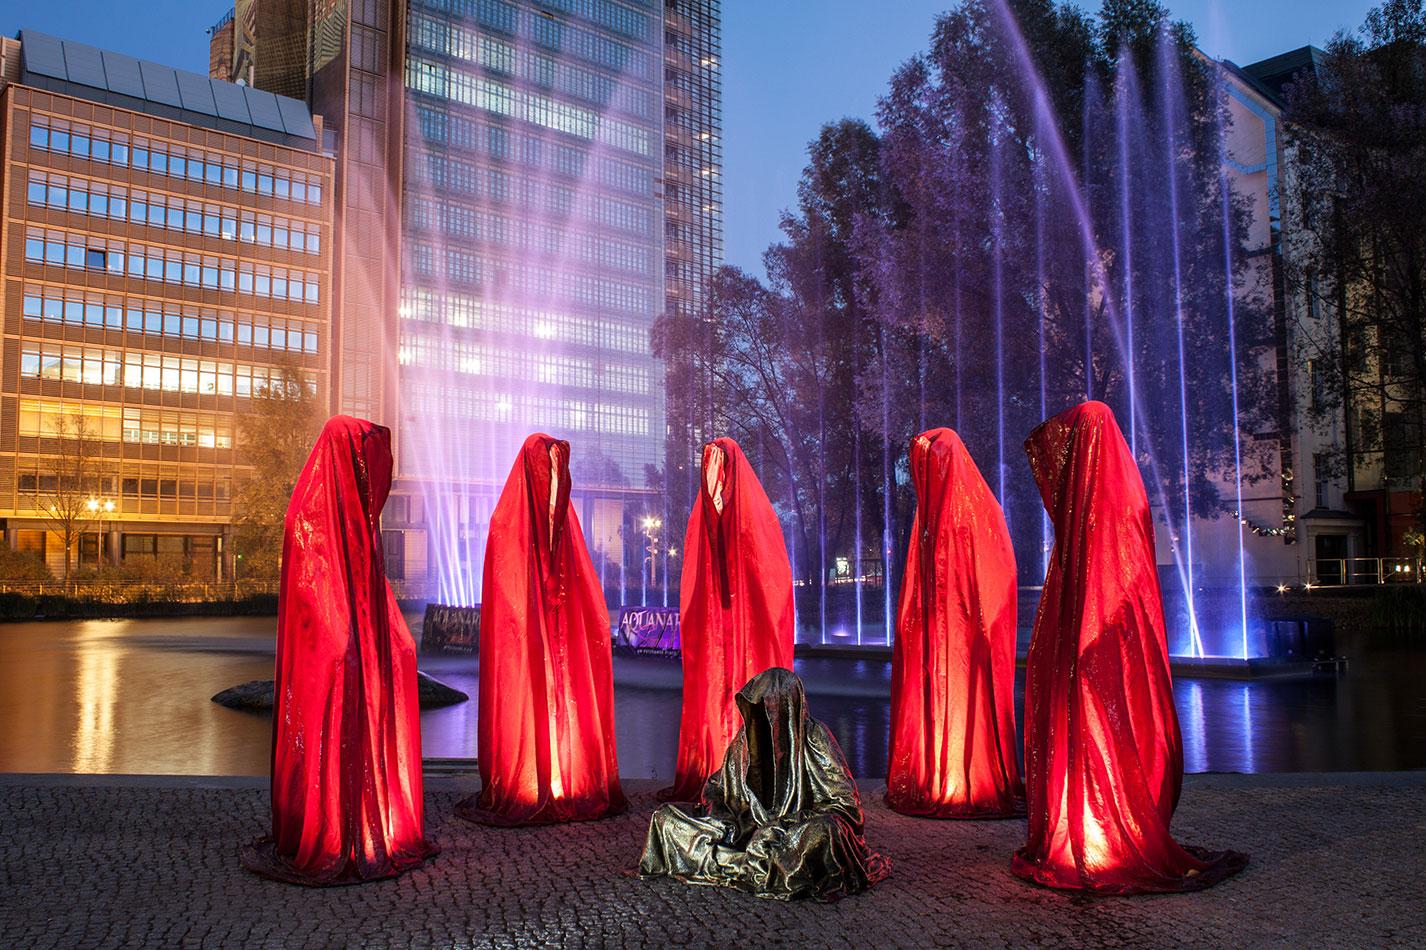 festival-of-lights-berlin-light-art-festival-contemporary-fine-art-design-show-guardiansof-time-manfred-kili-kielnhofer-sculpture-3736